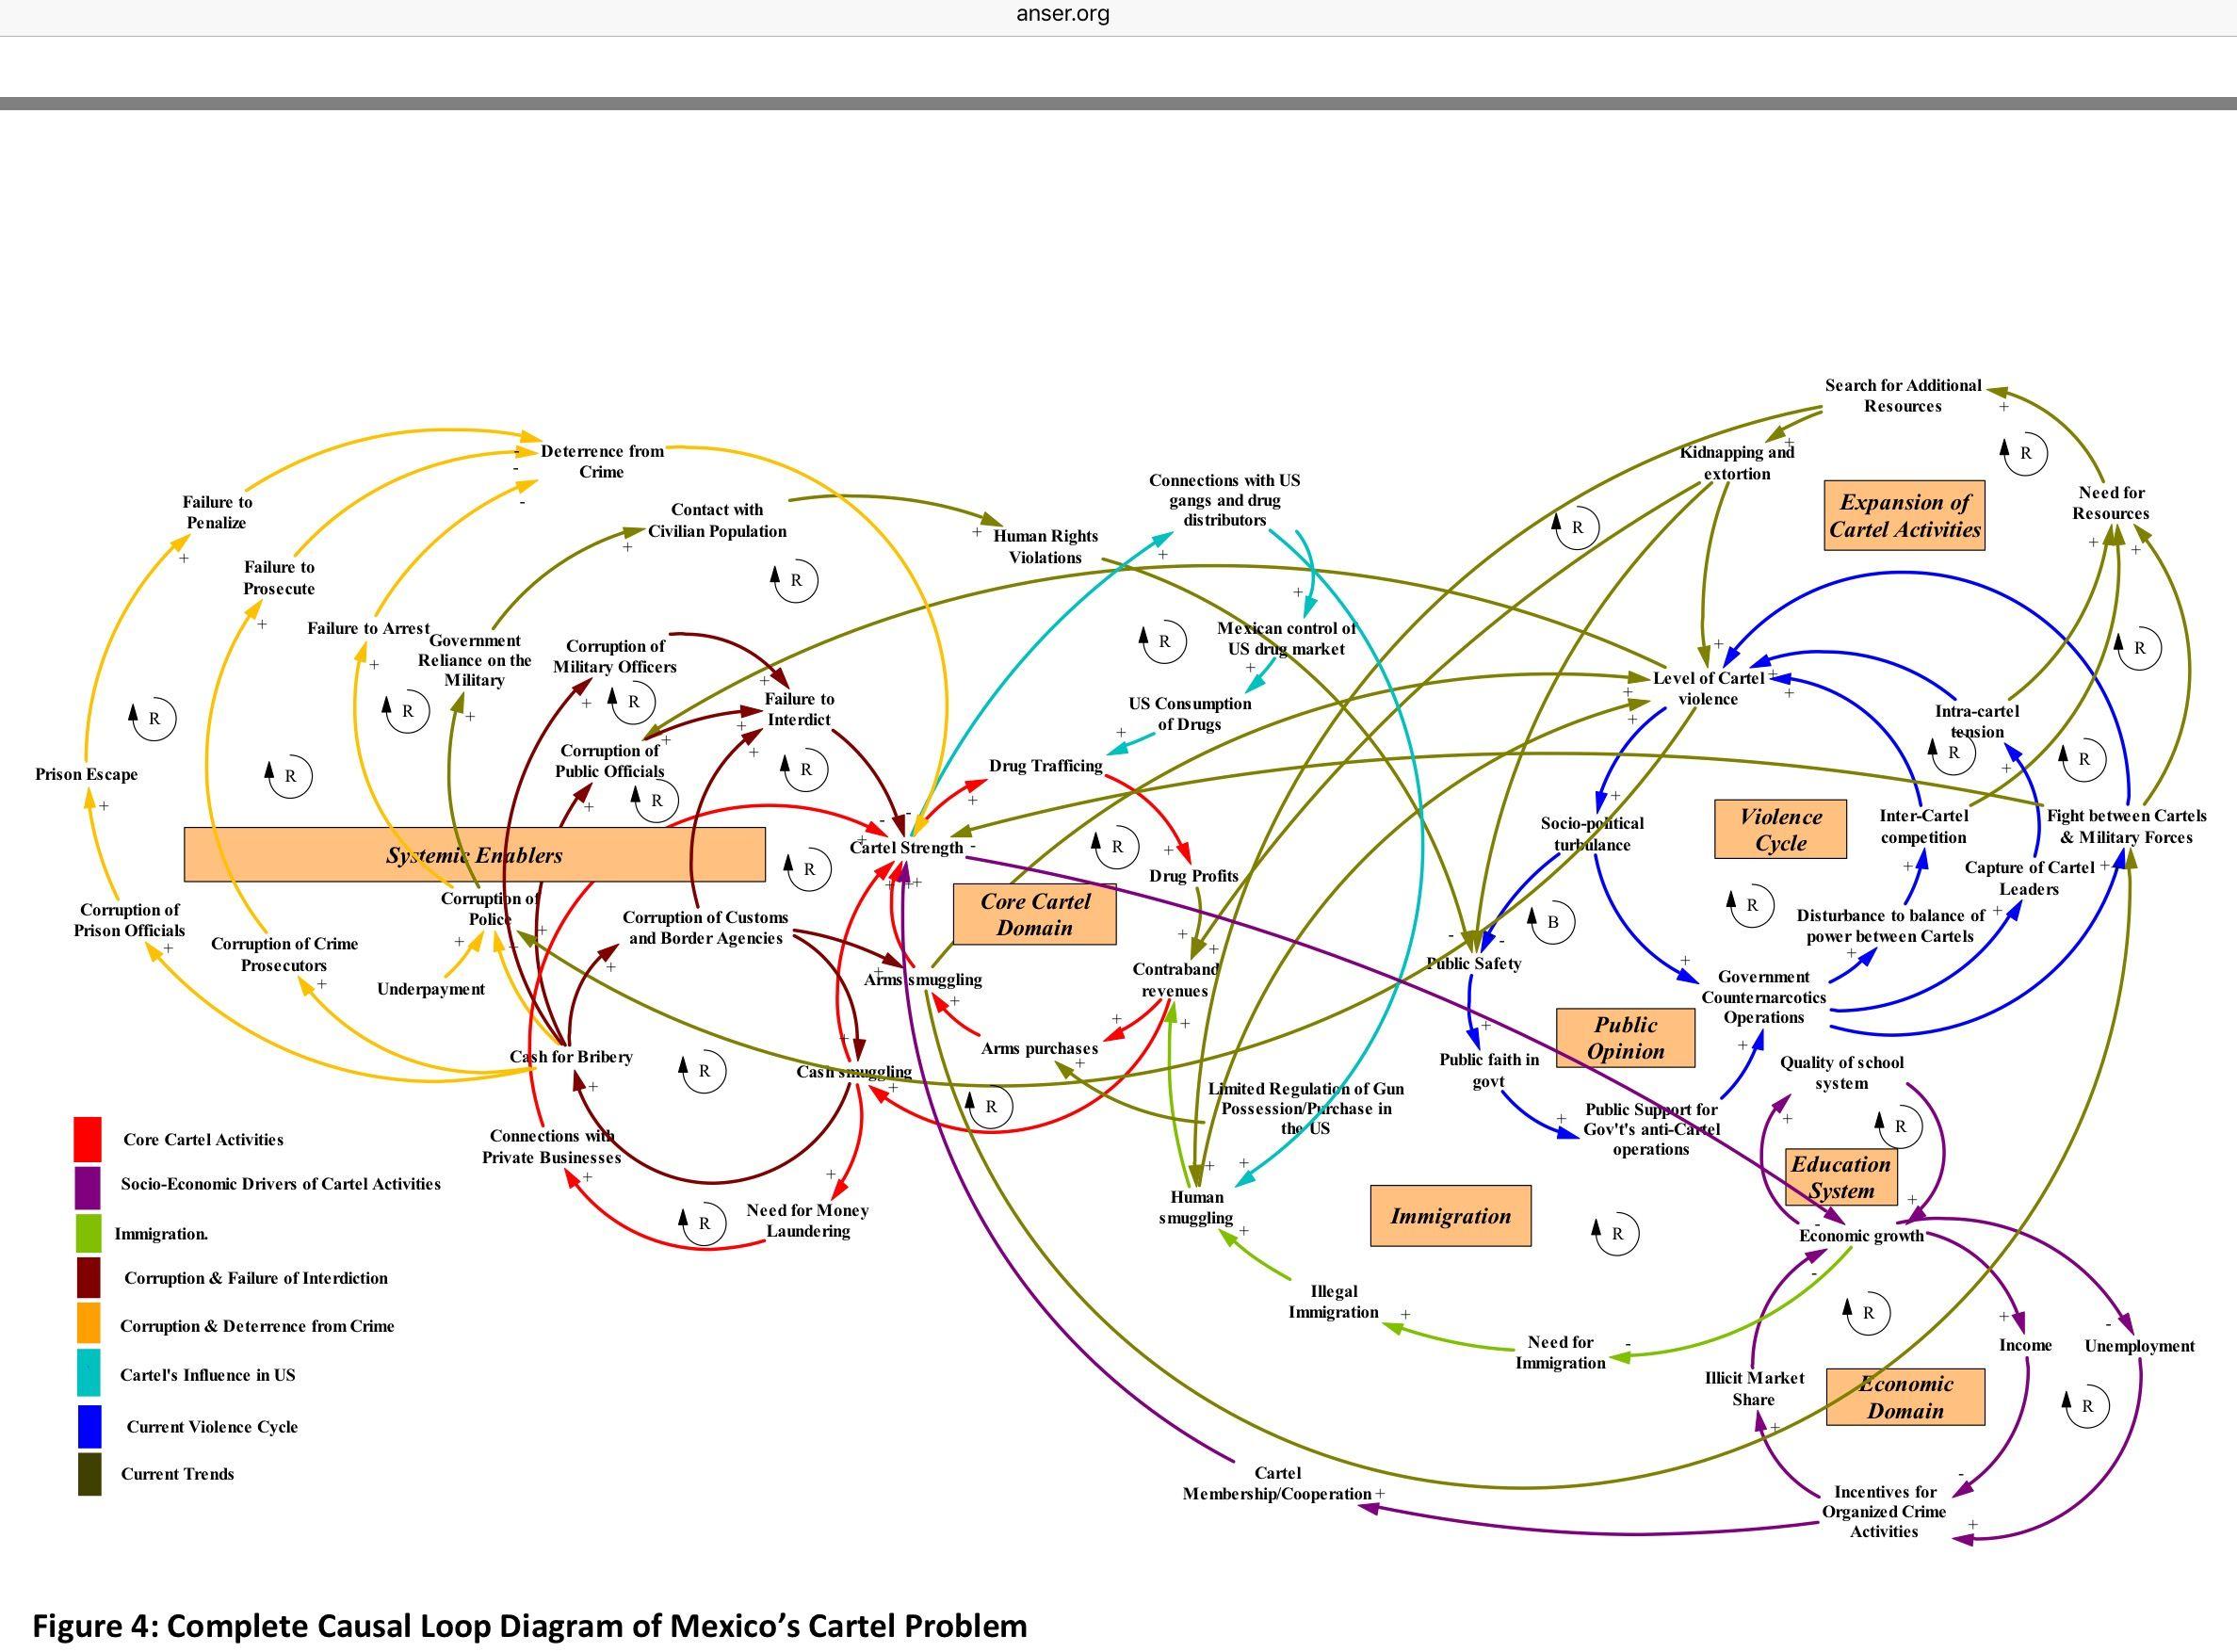 Causal Loop Diagram Of Mexico S Cartel Problem